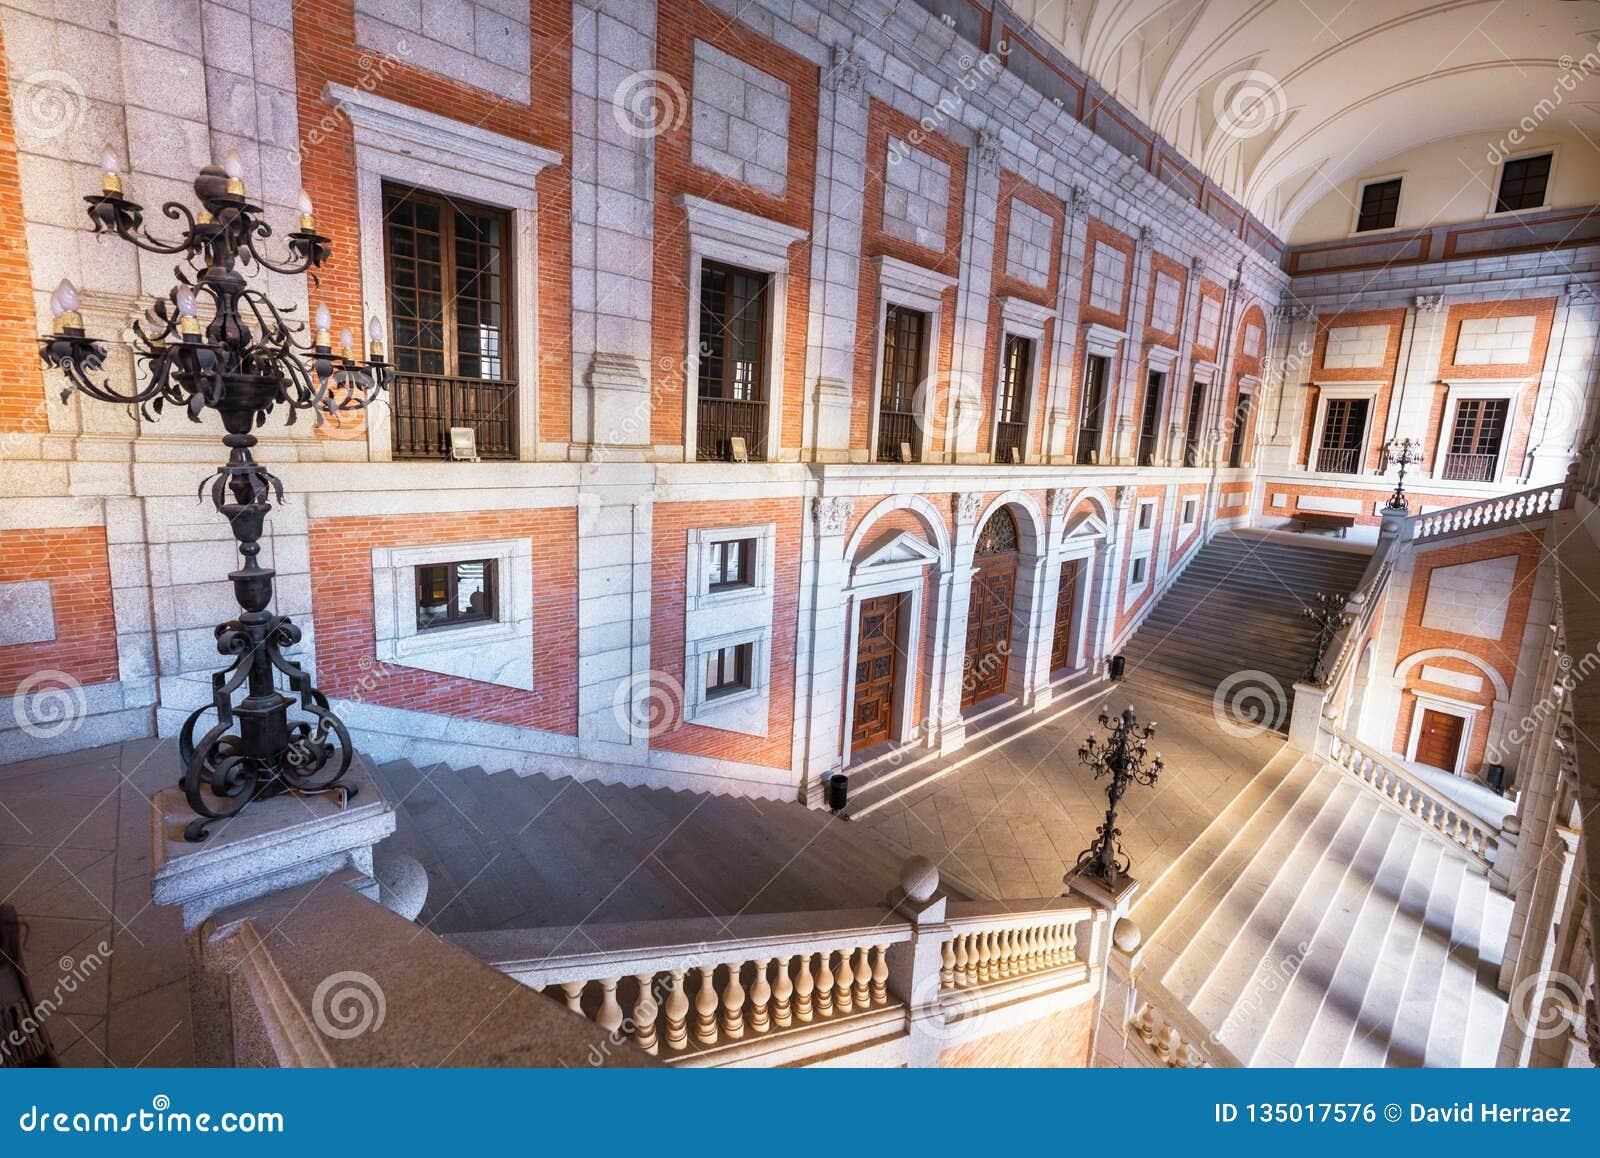 Toledo, Spain - December 16, 2018: Interior courtyard of Alcazar of Toledo, Castilla la Mancha, Spain